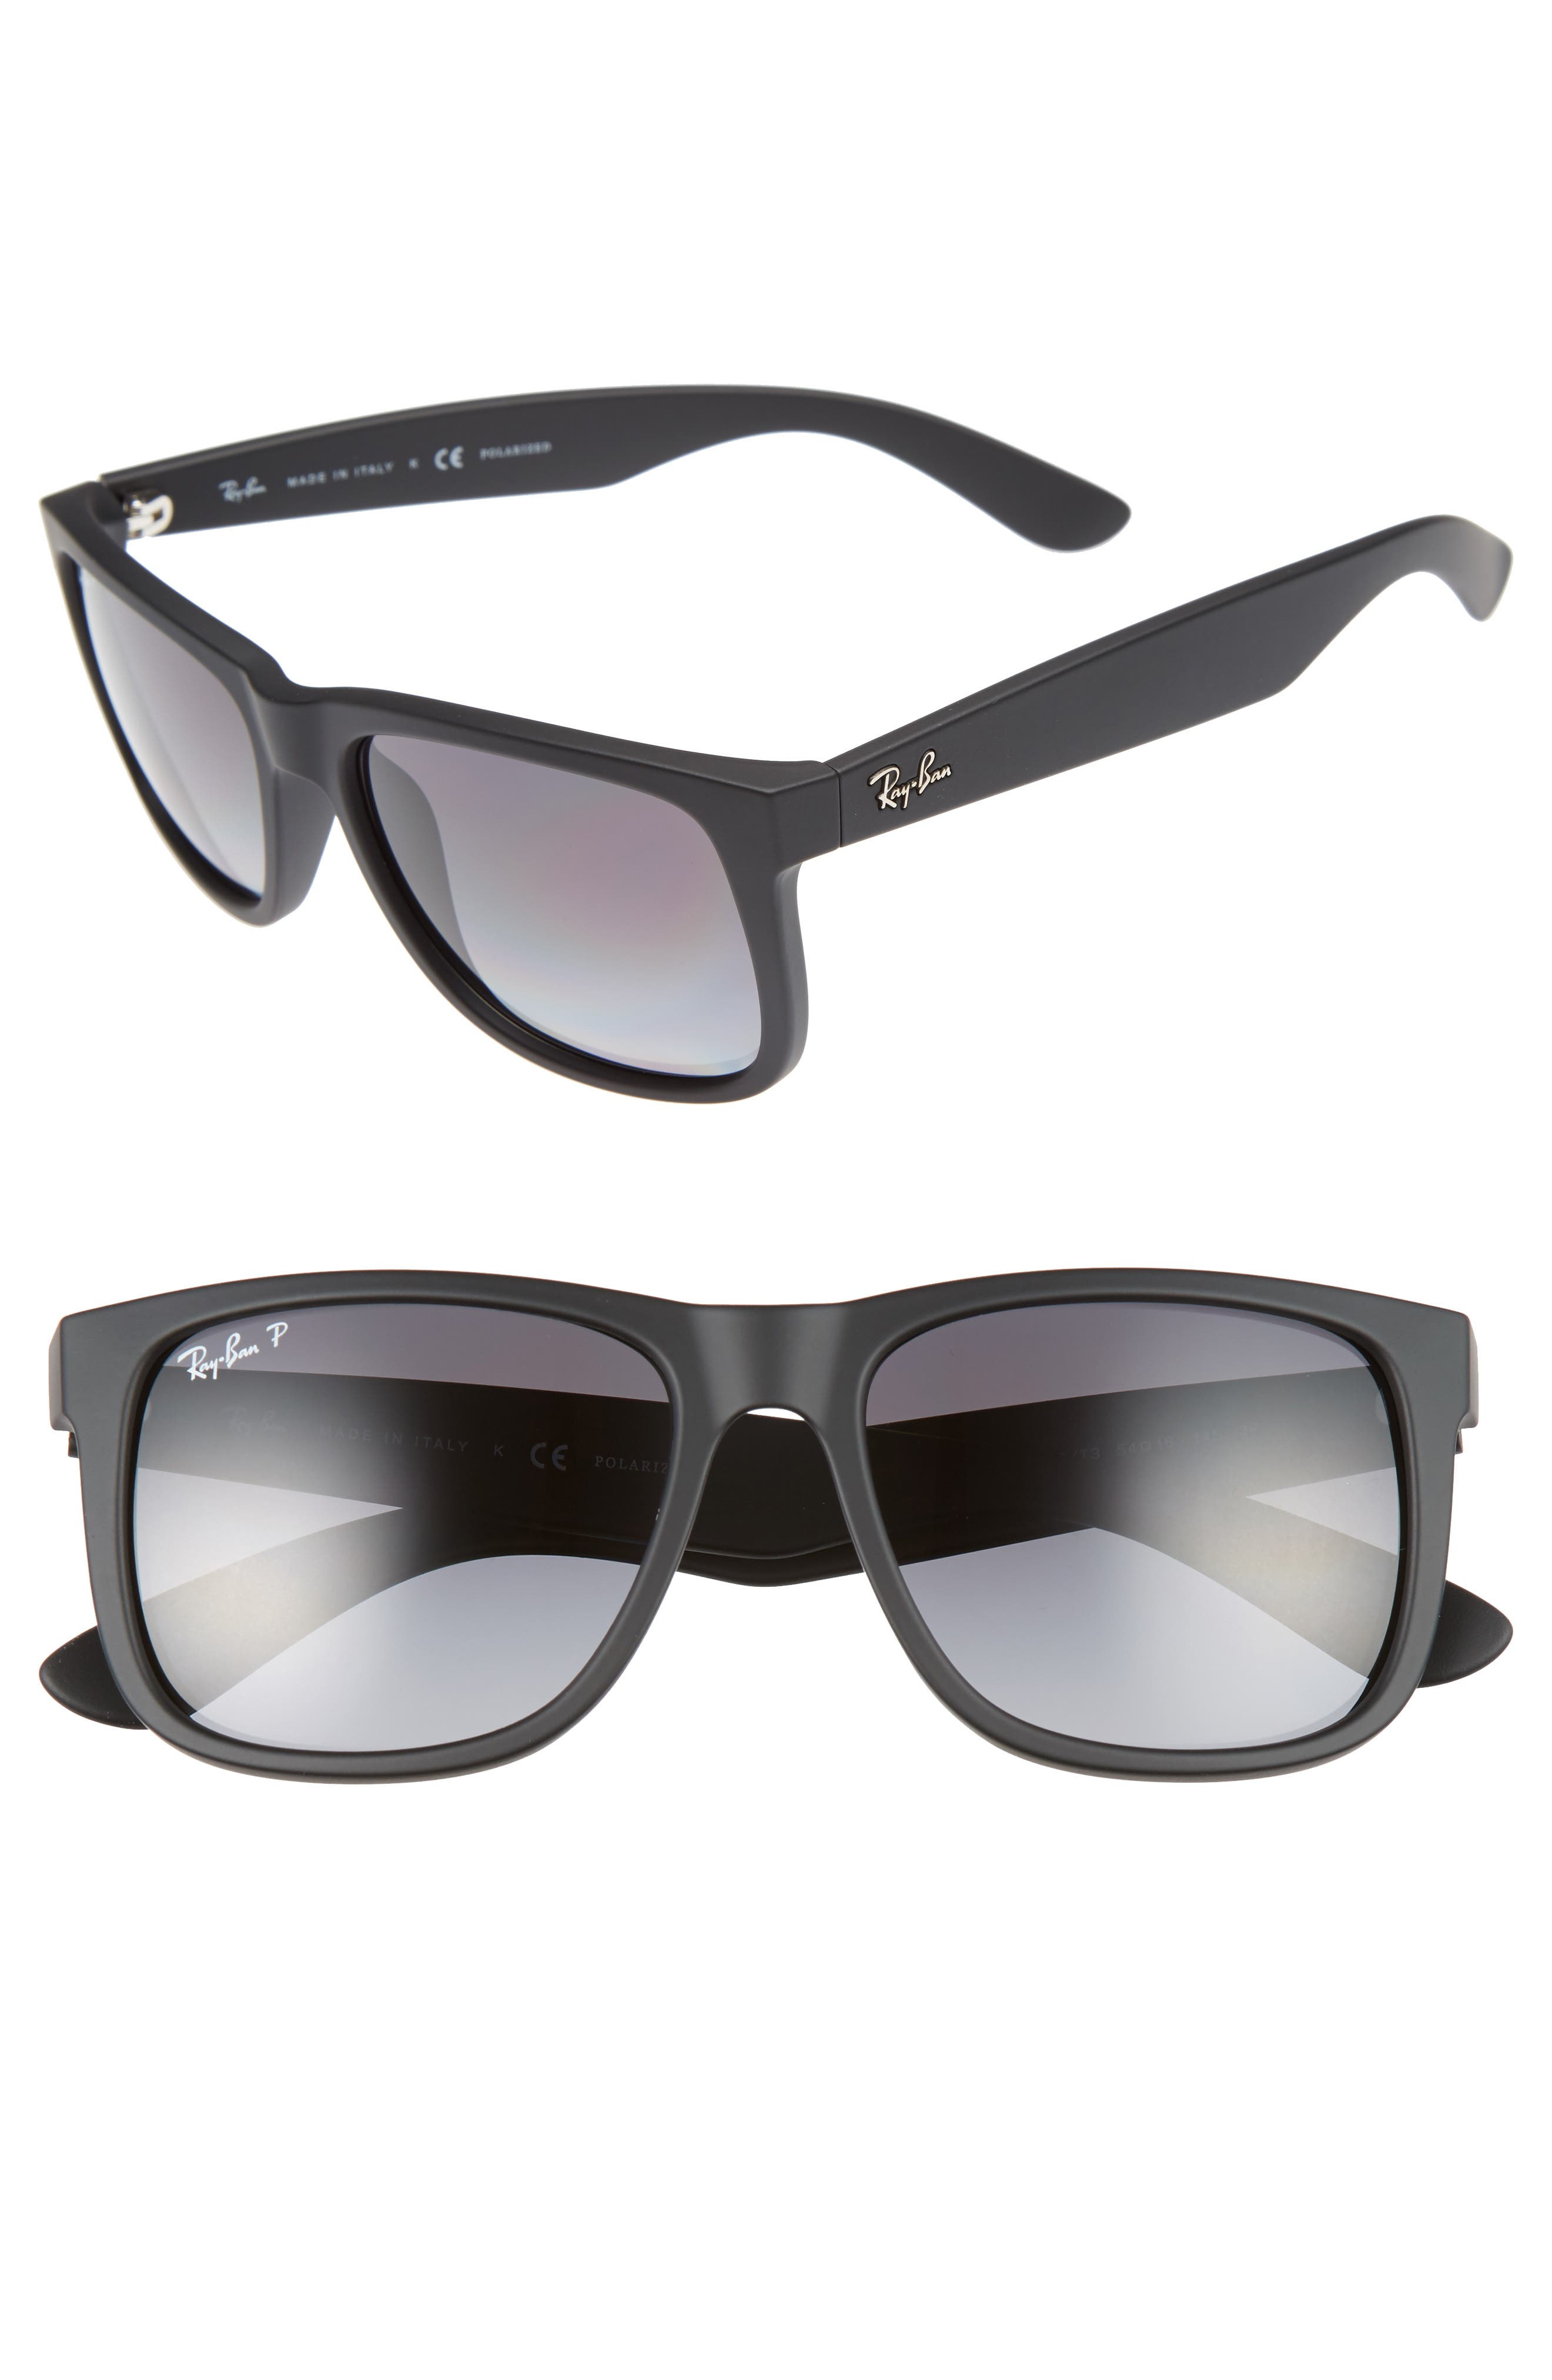 Ray-Ban Justin 5m Polarized Sunglasses -